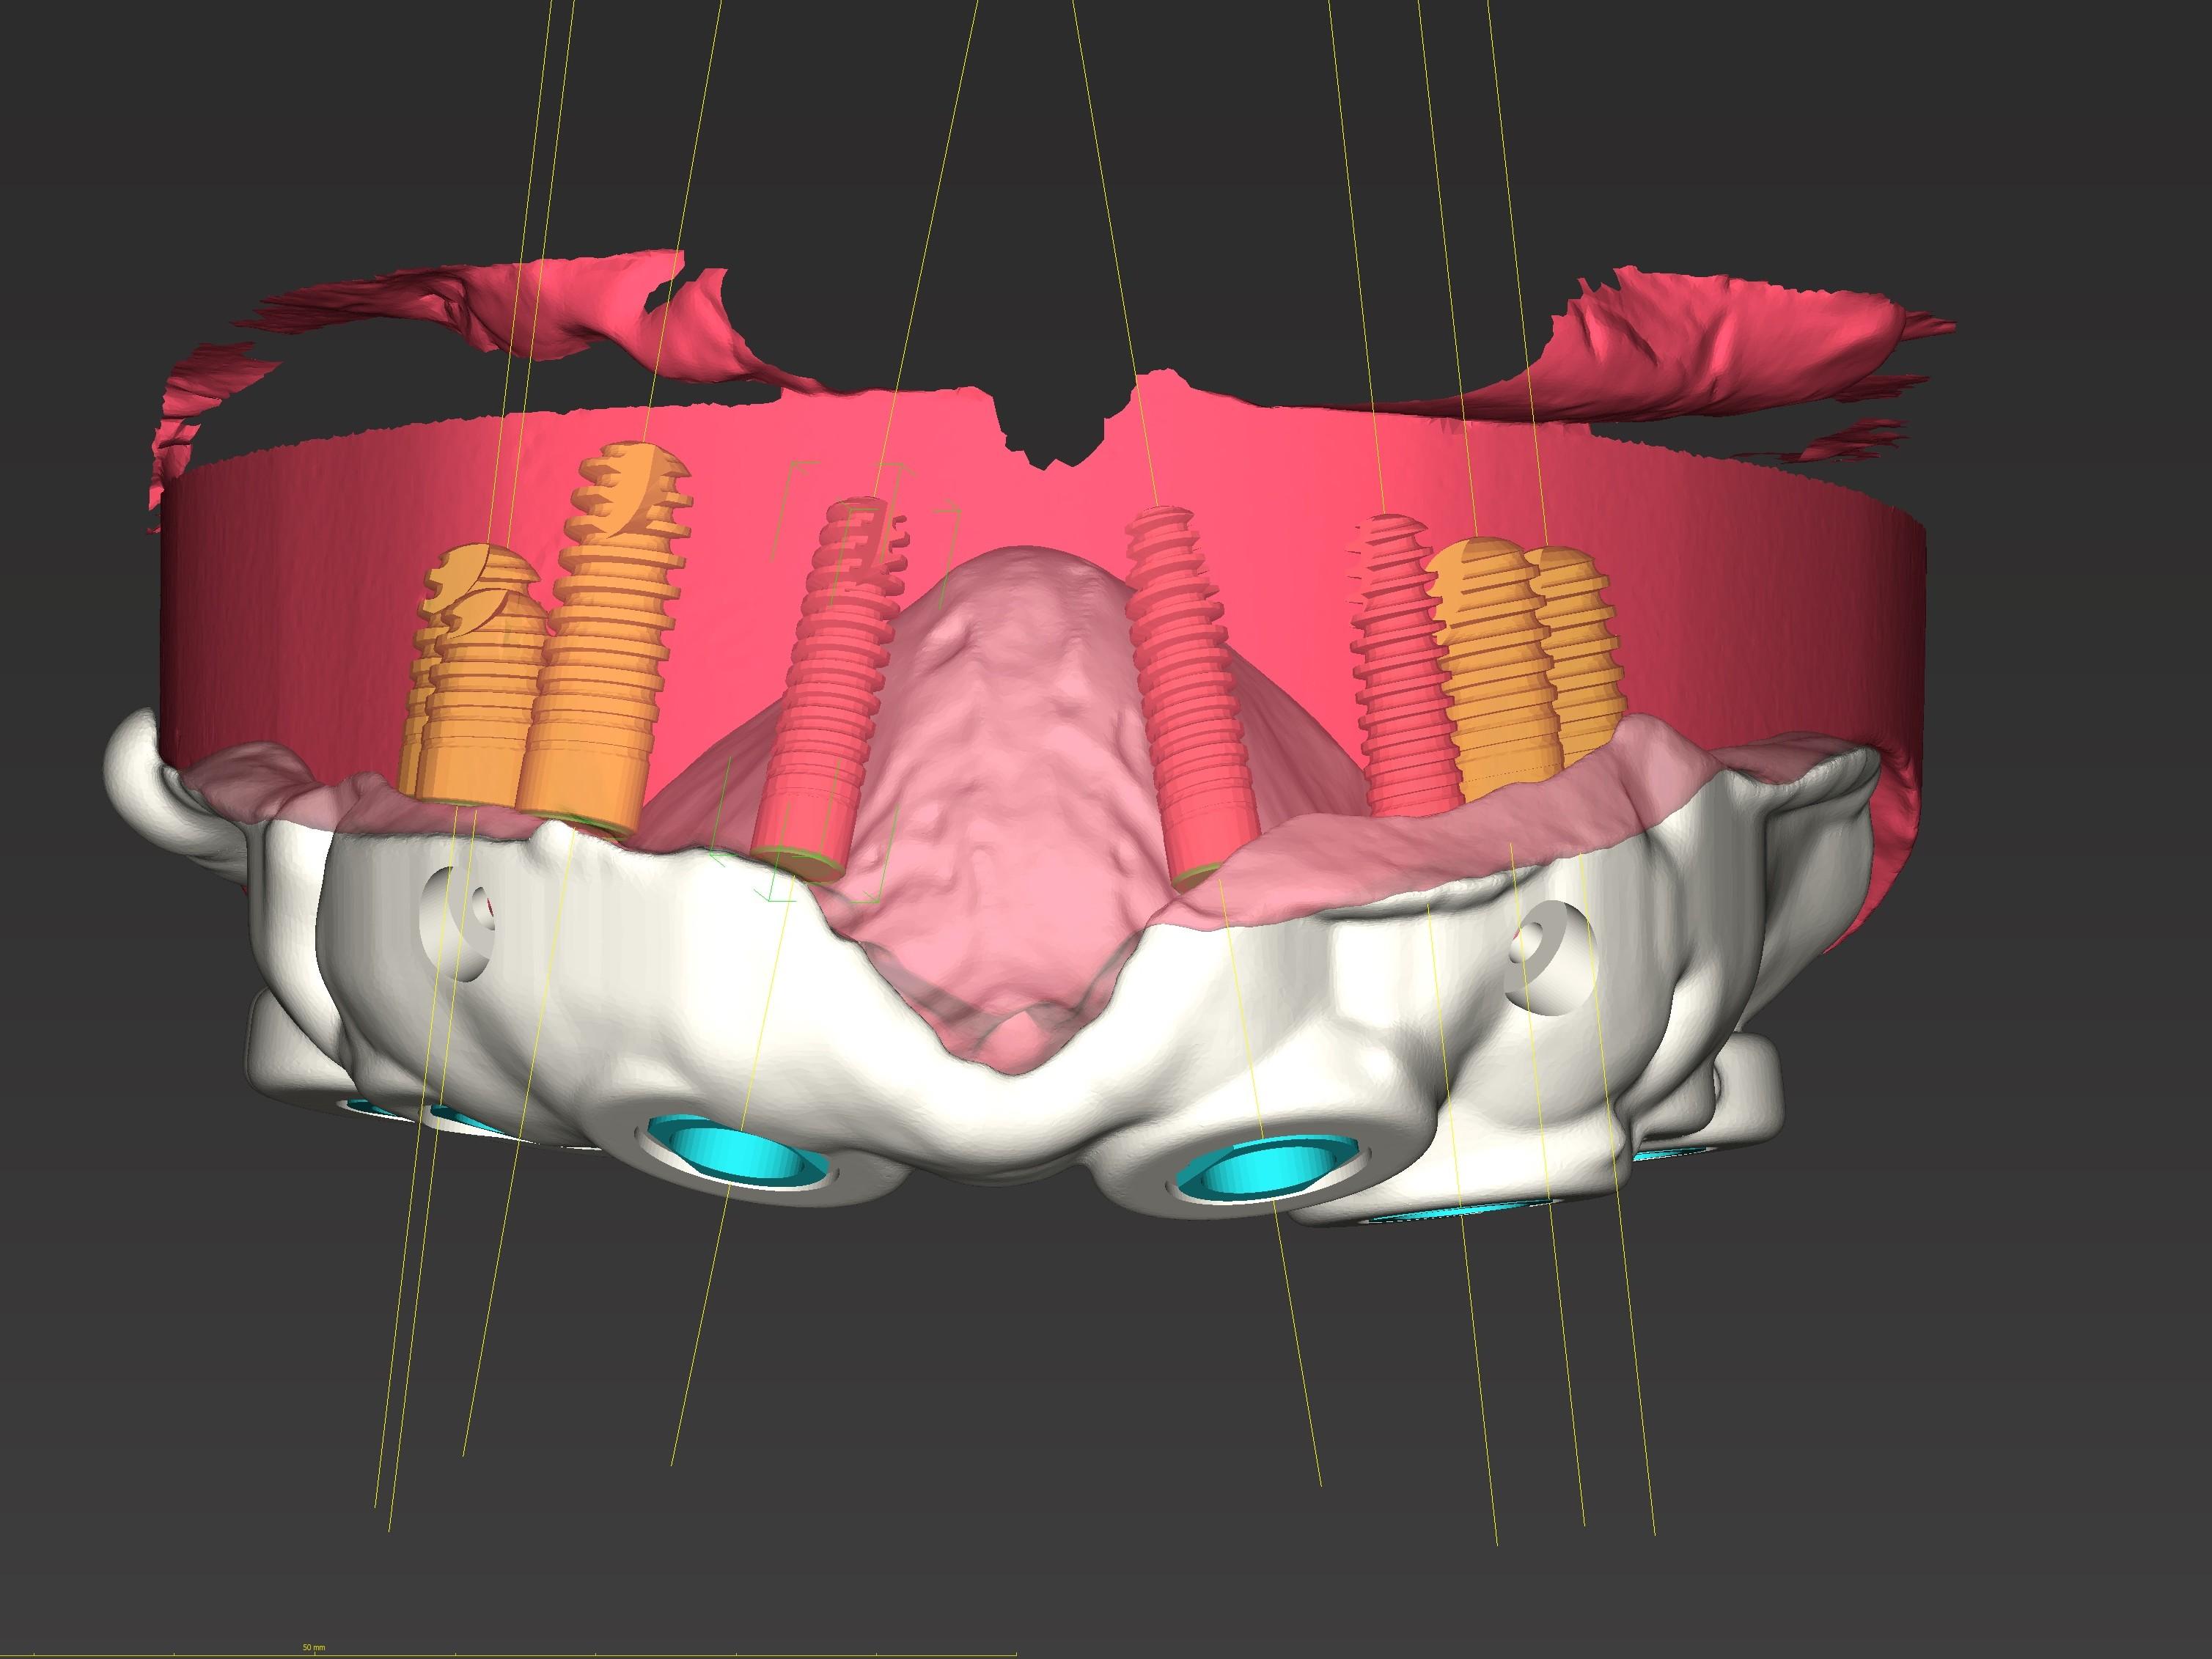 Abb. 5: Virtuelle Bohrschablone